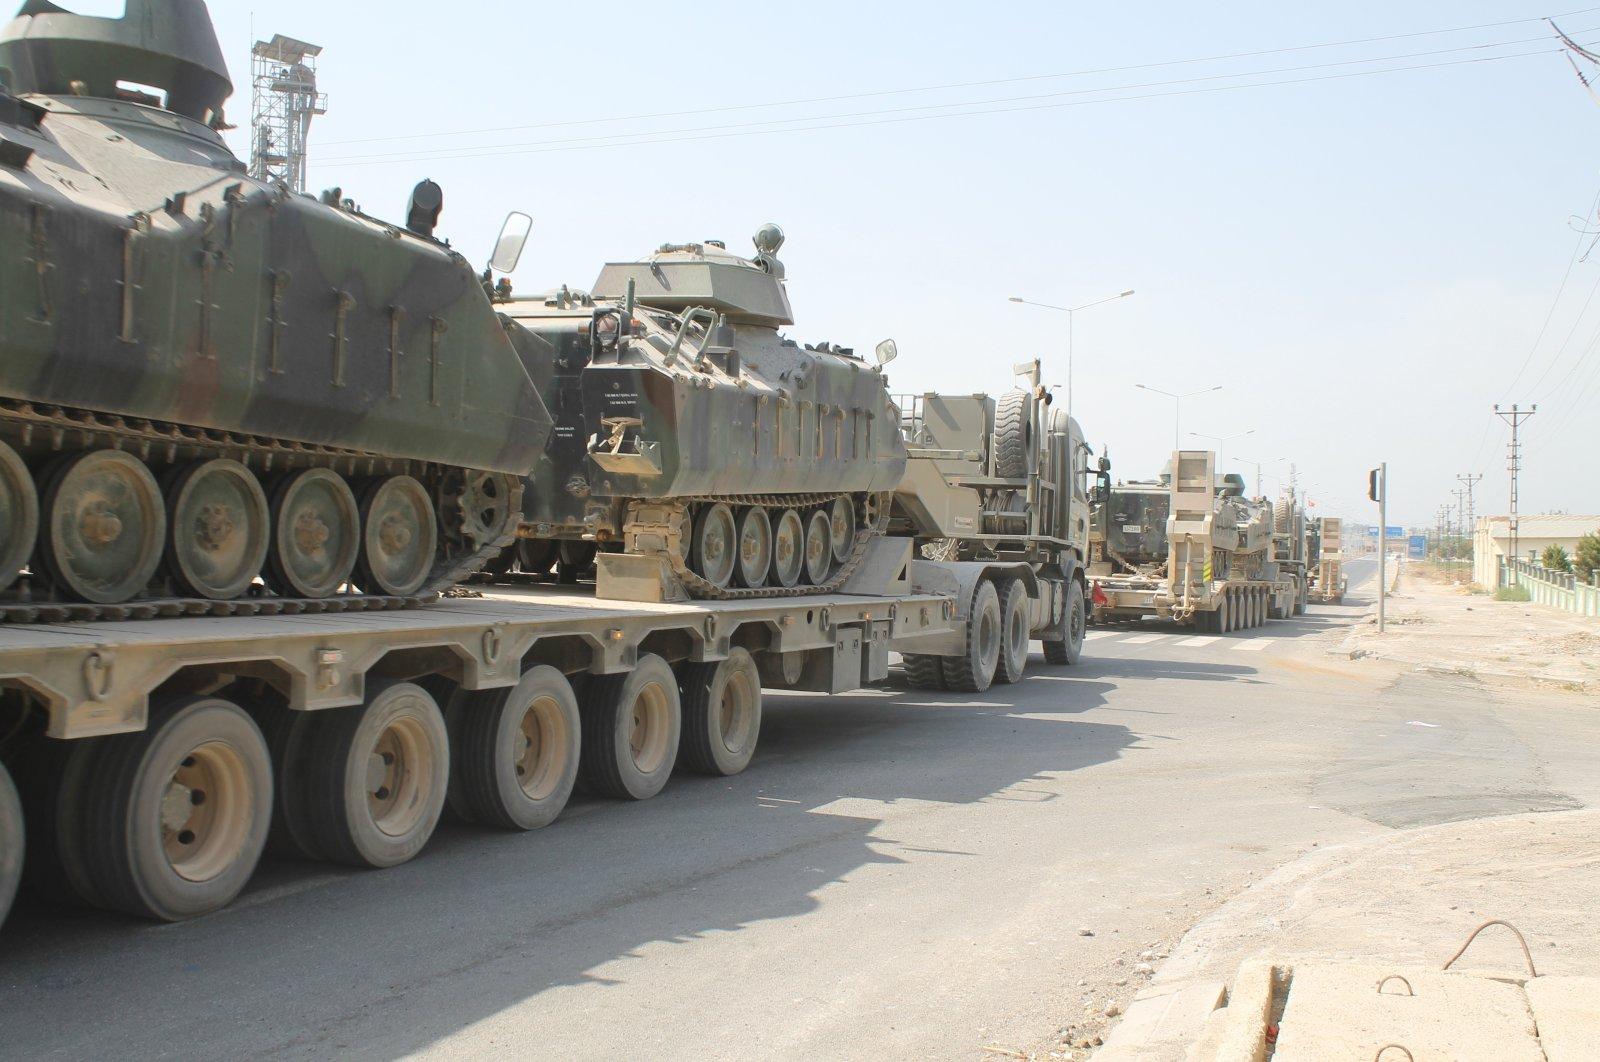 Tank-loaded truck left from Hatay's Reyhanlı district for deployment to Greek border, September 5, 2020. (İHA Photo)